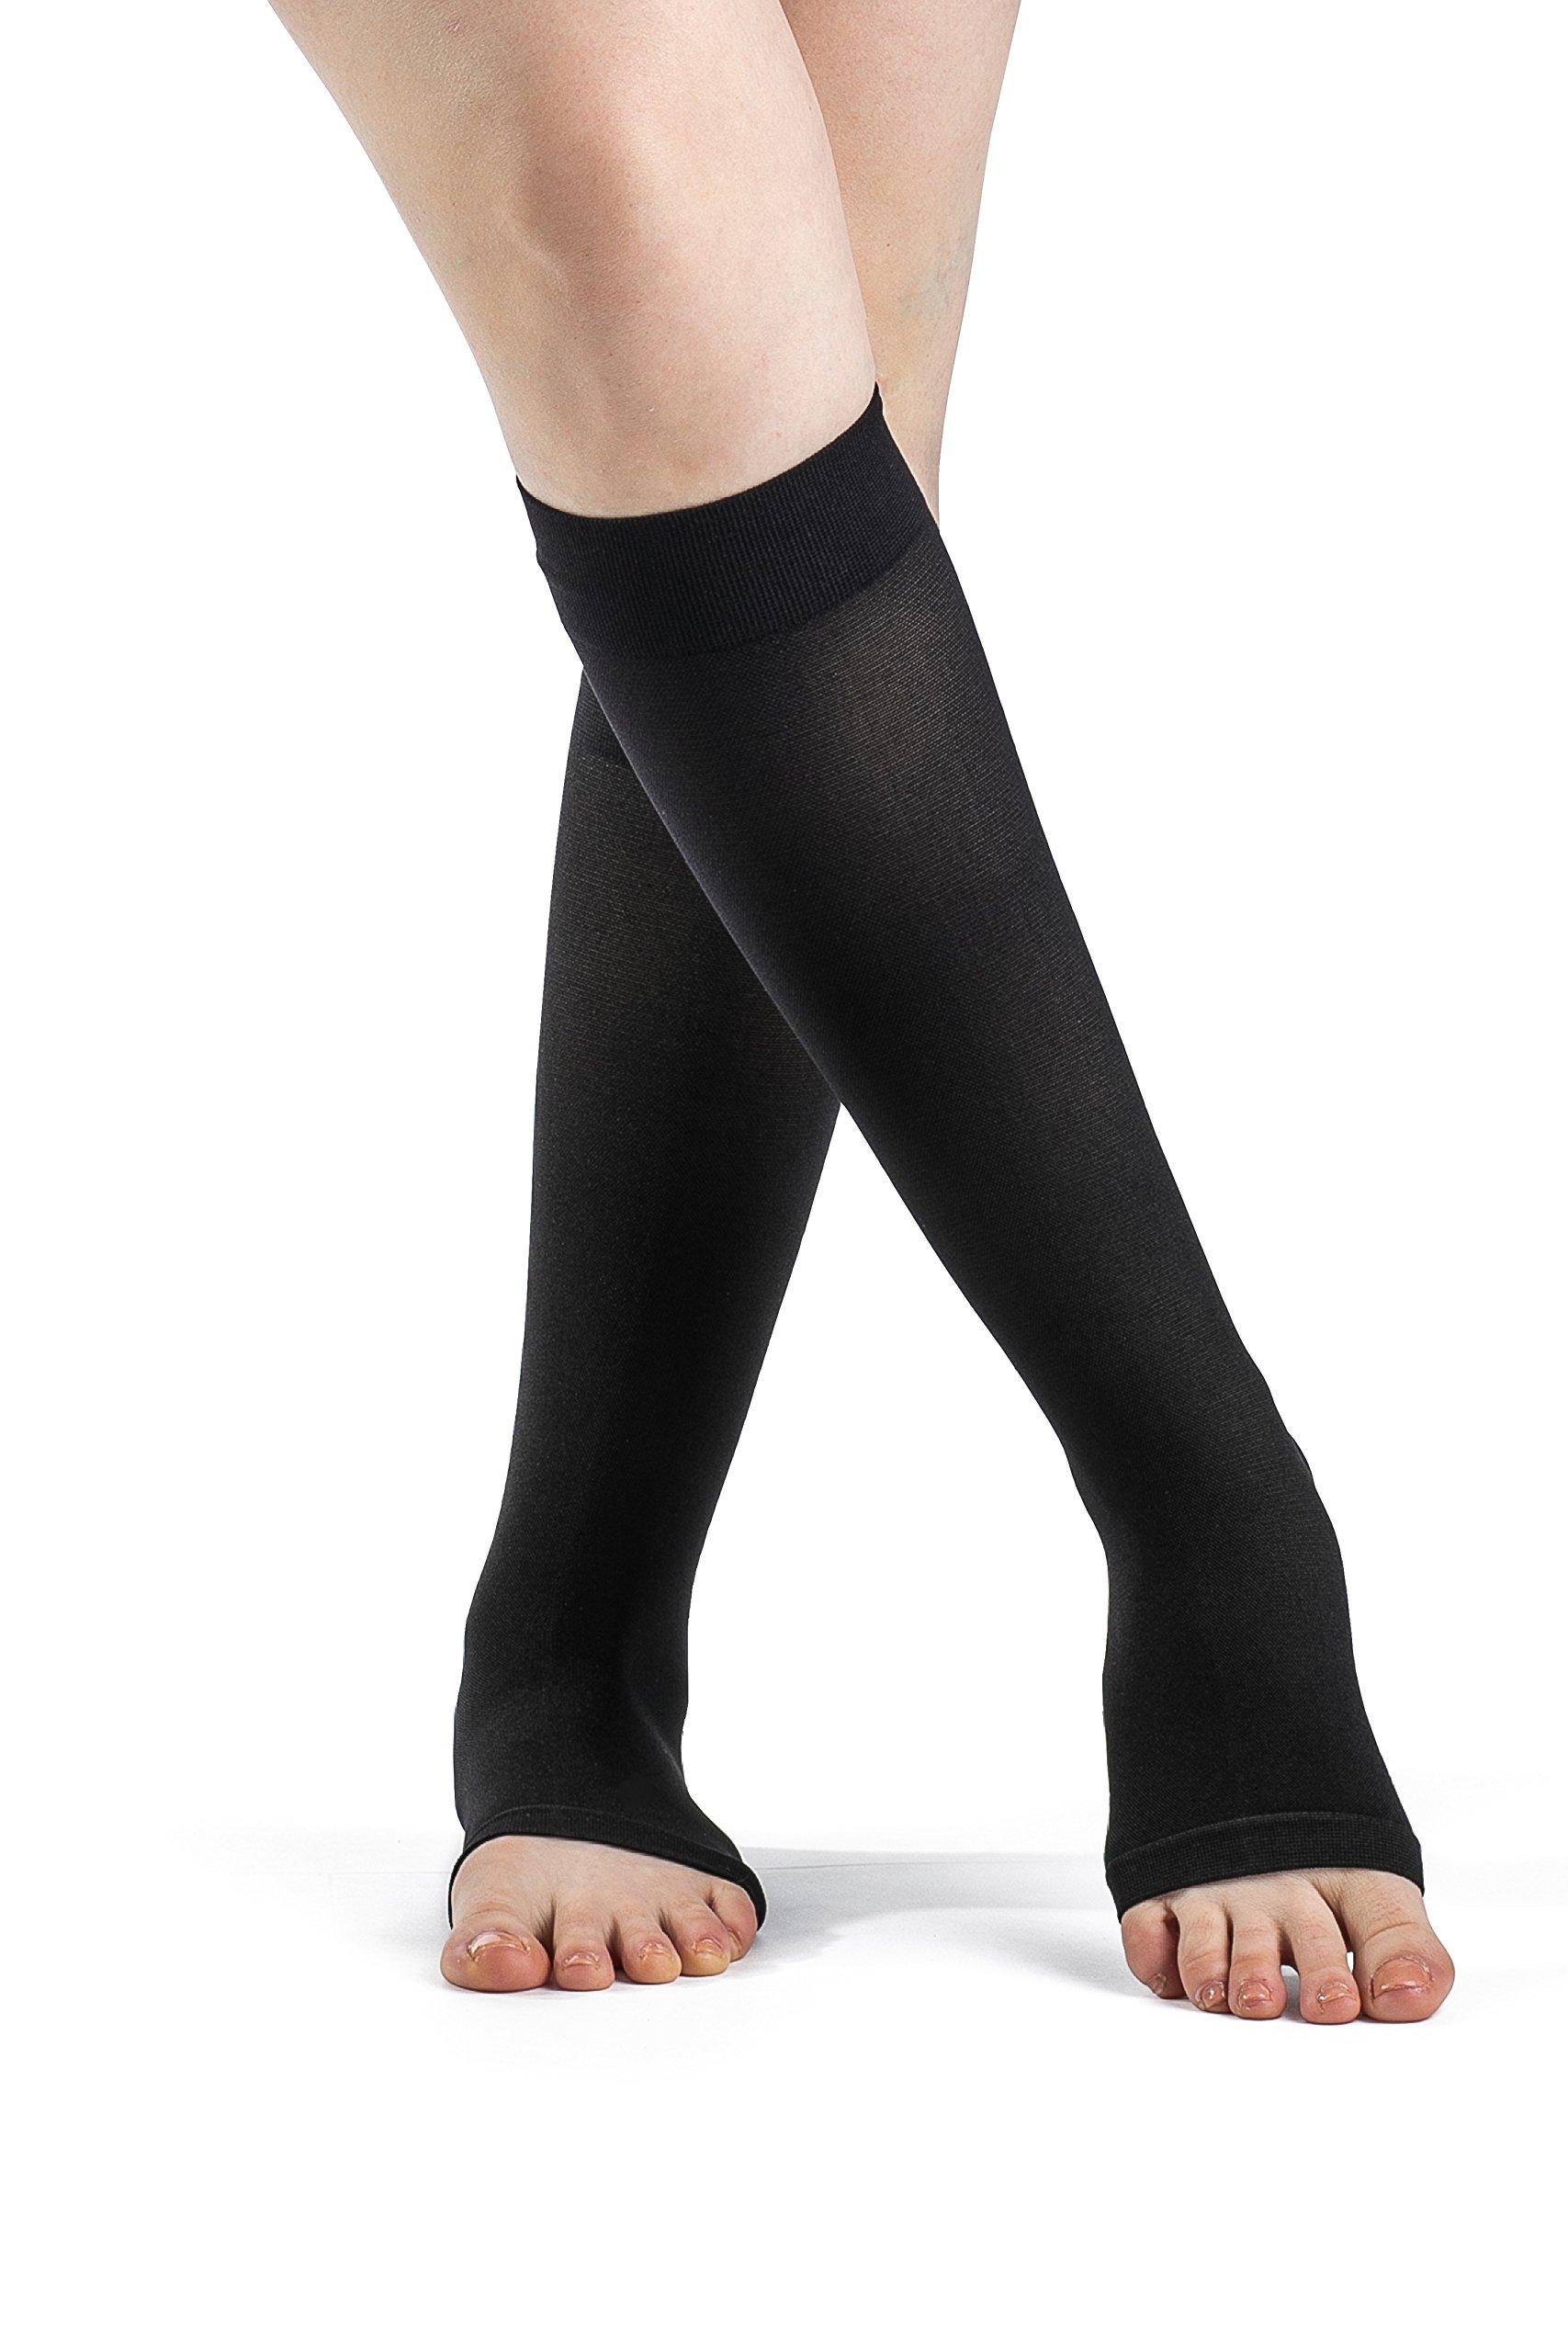 711465b630 Amazon.com: SIGVARIS Women's ACCESS 970 Open-Toe Calf High Medical  Compression 20-30mmHg: Health & Personal Care